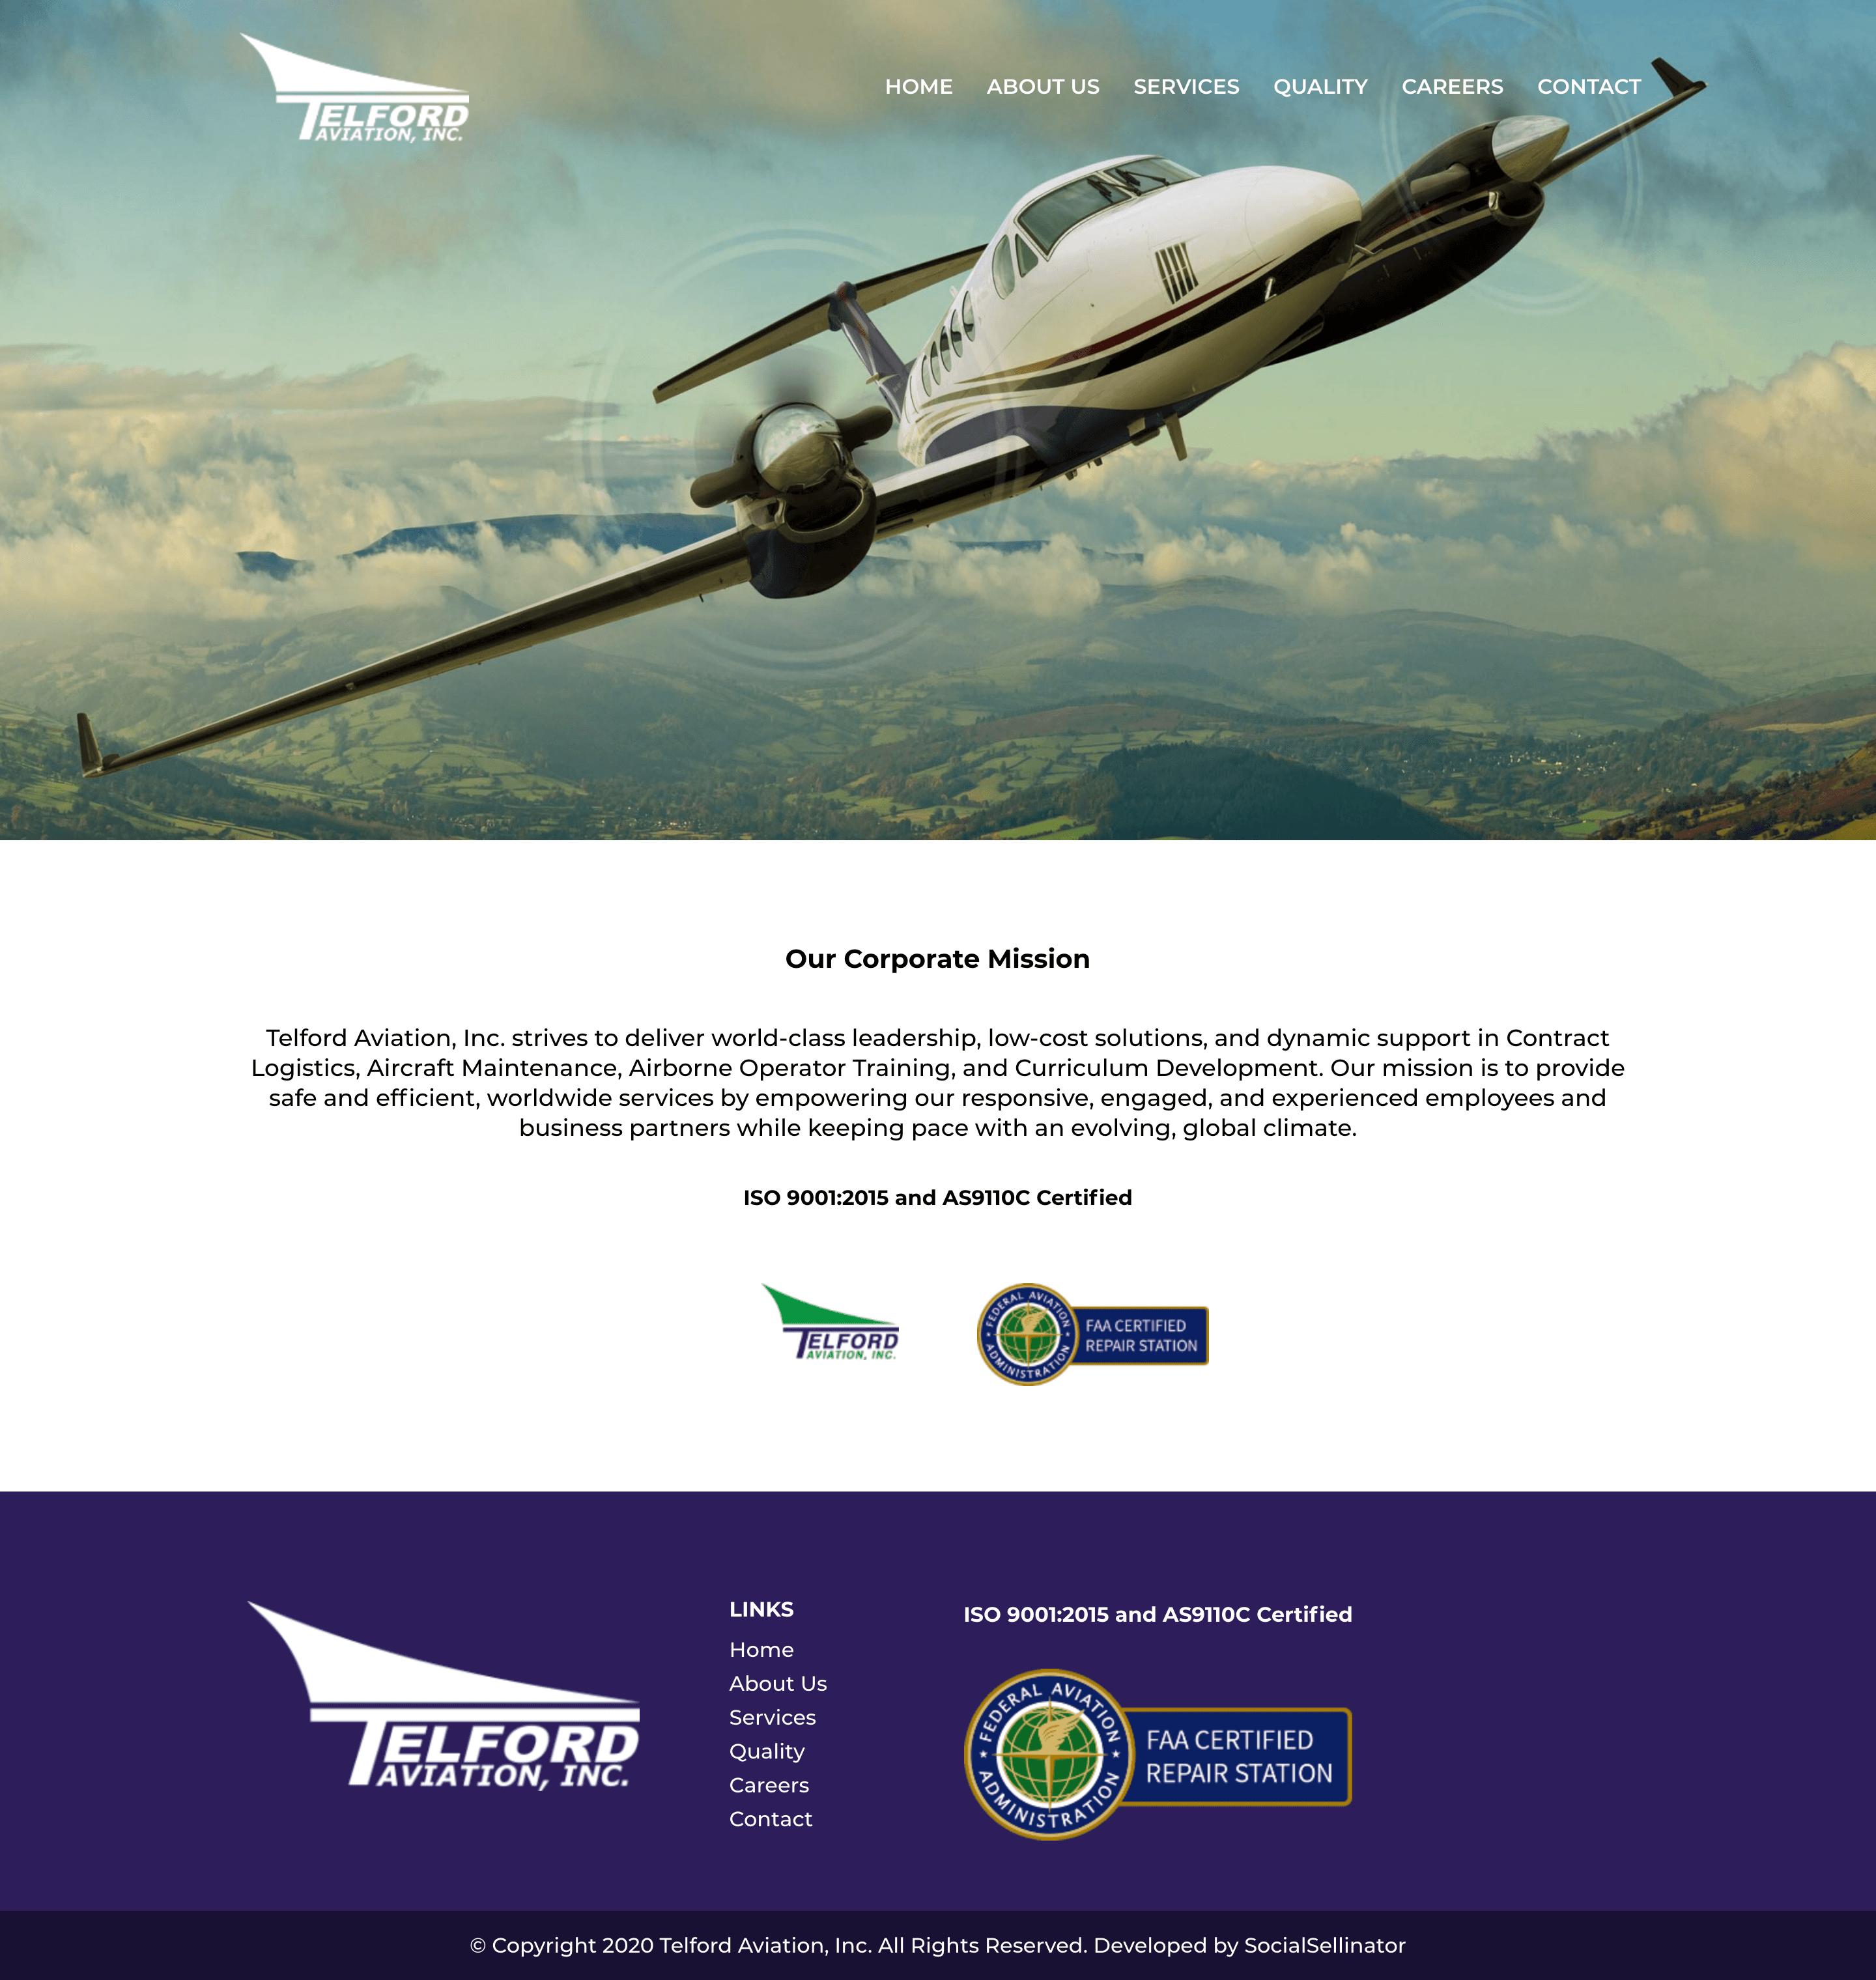 Tellford Aviation